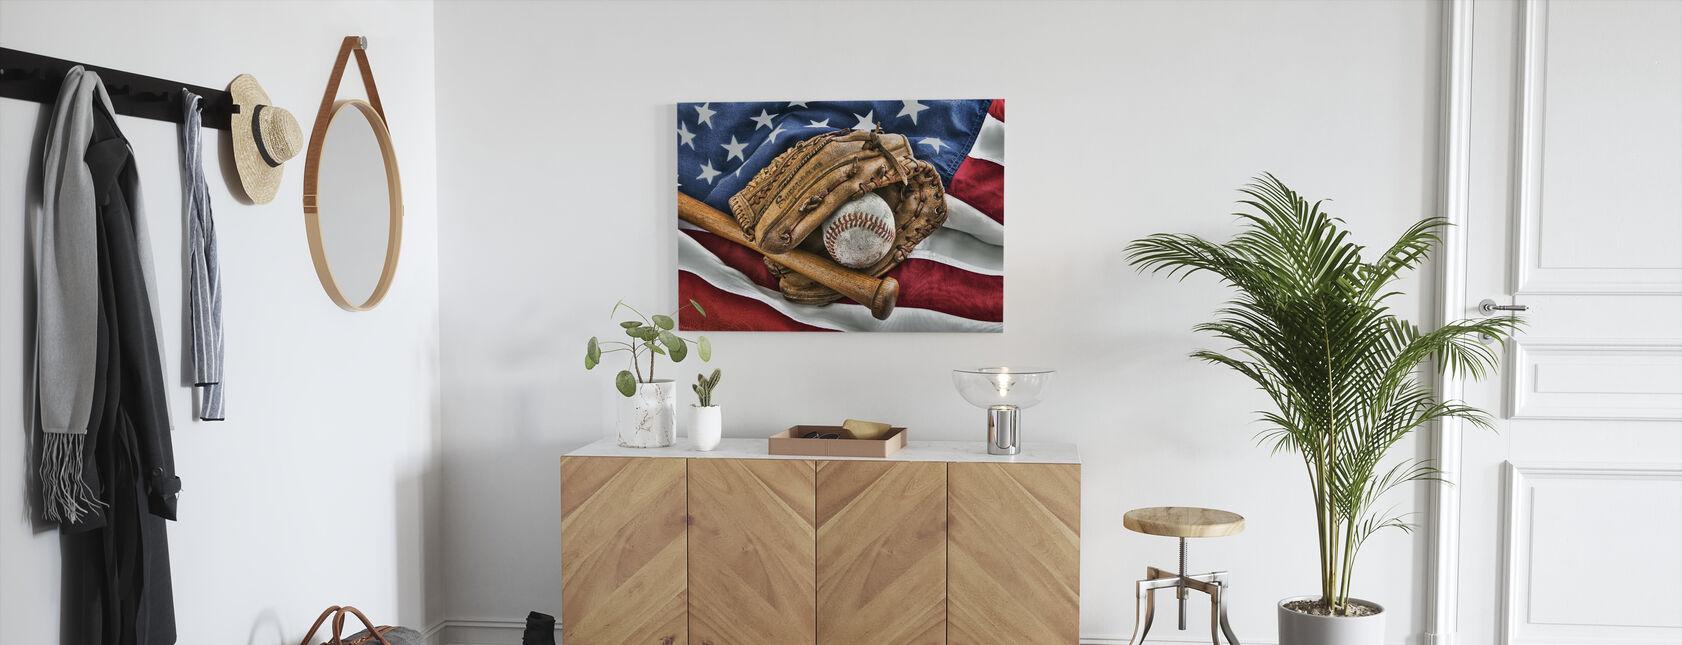 Vintage Baseball Handschoen - Canvas print - Gang